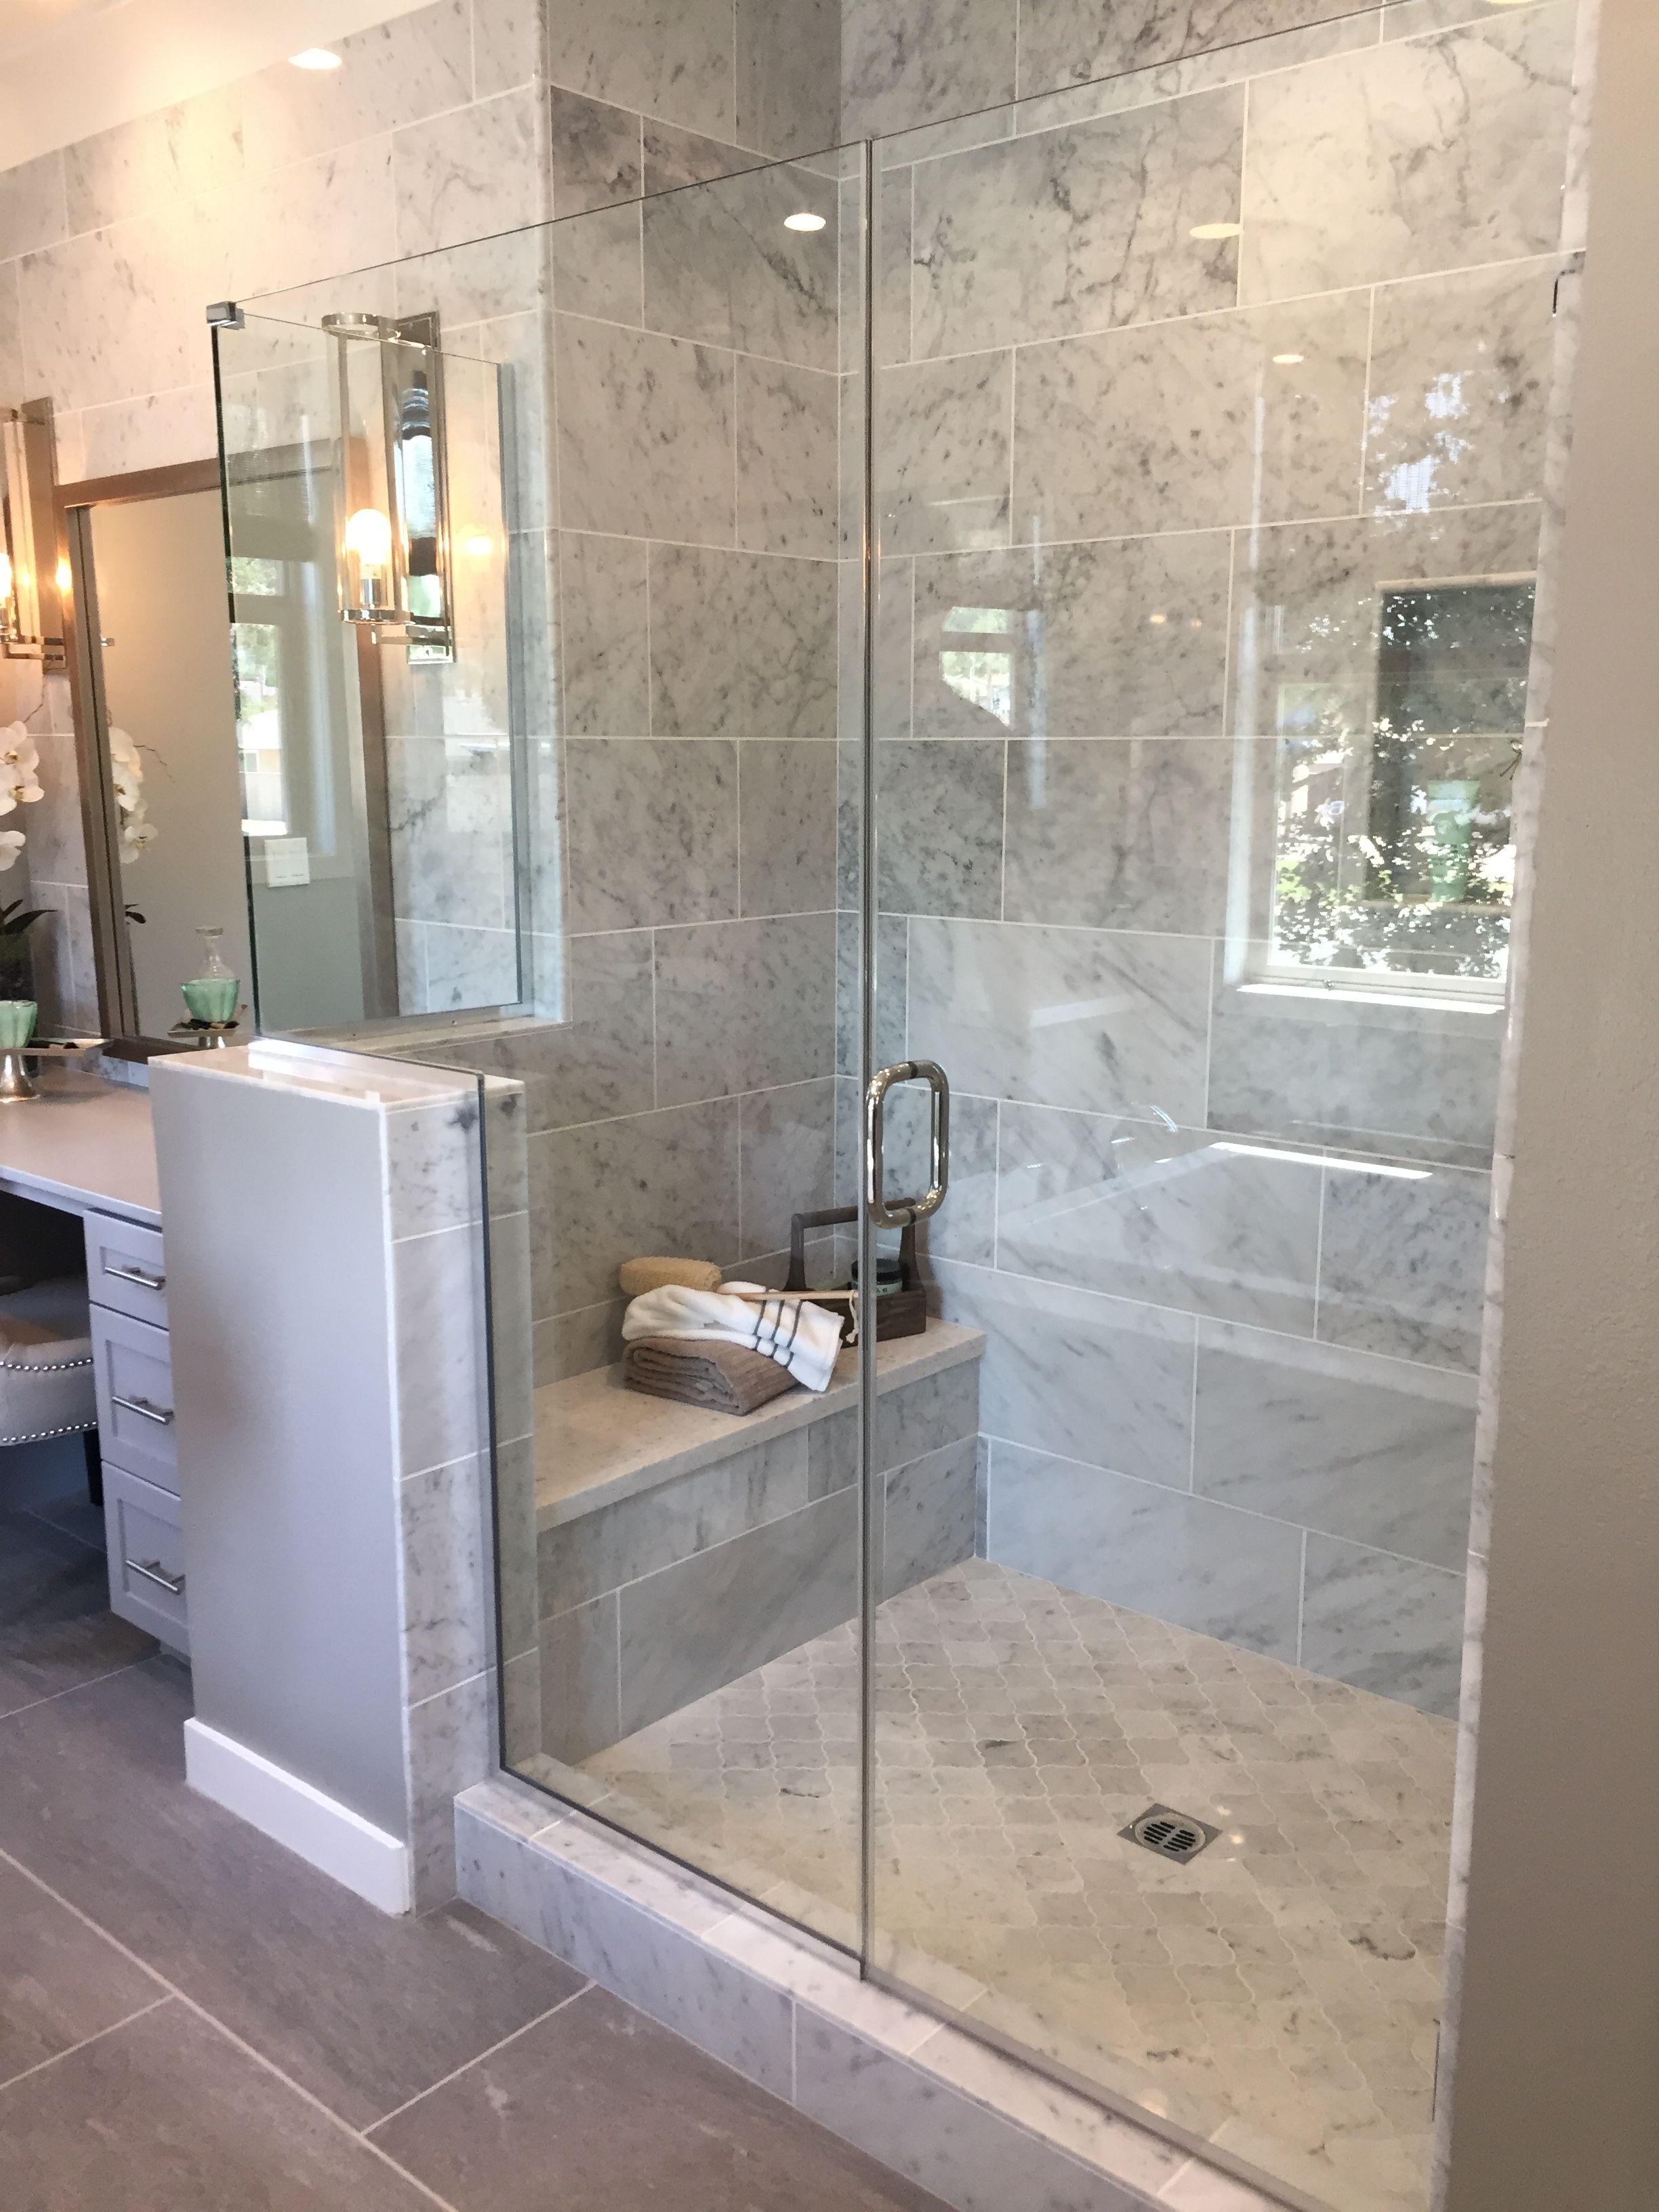 Master bedroom without bathroom  Pin by Tiffany KirchnerDixon on Rental house  Pinterest  Bath